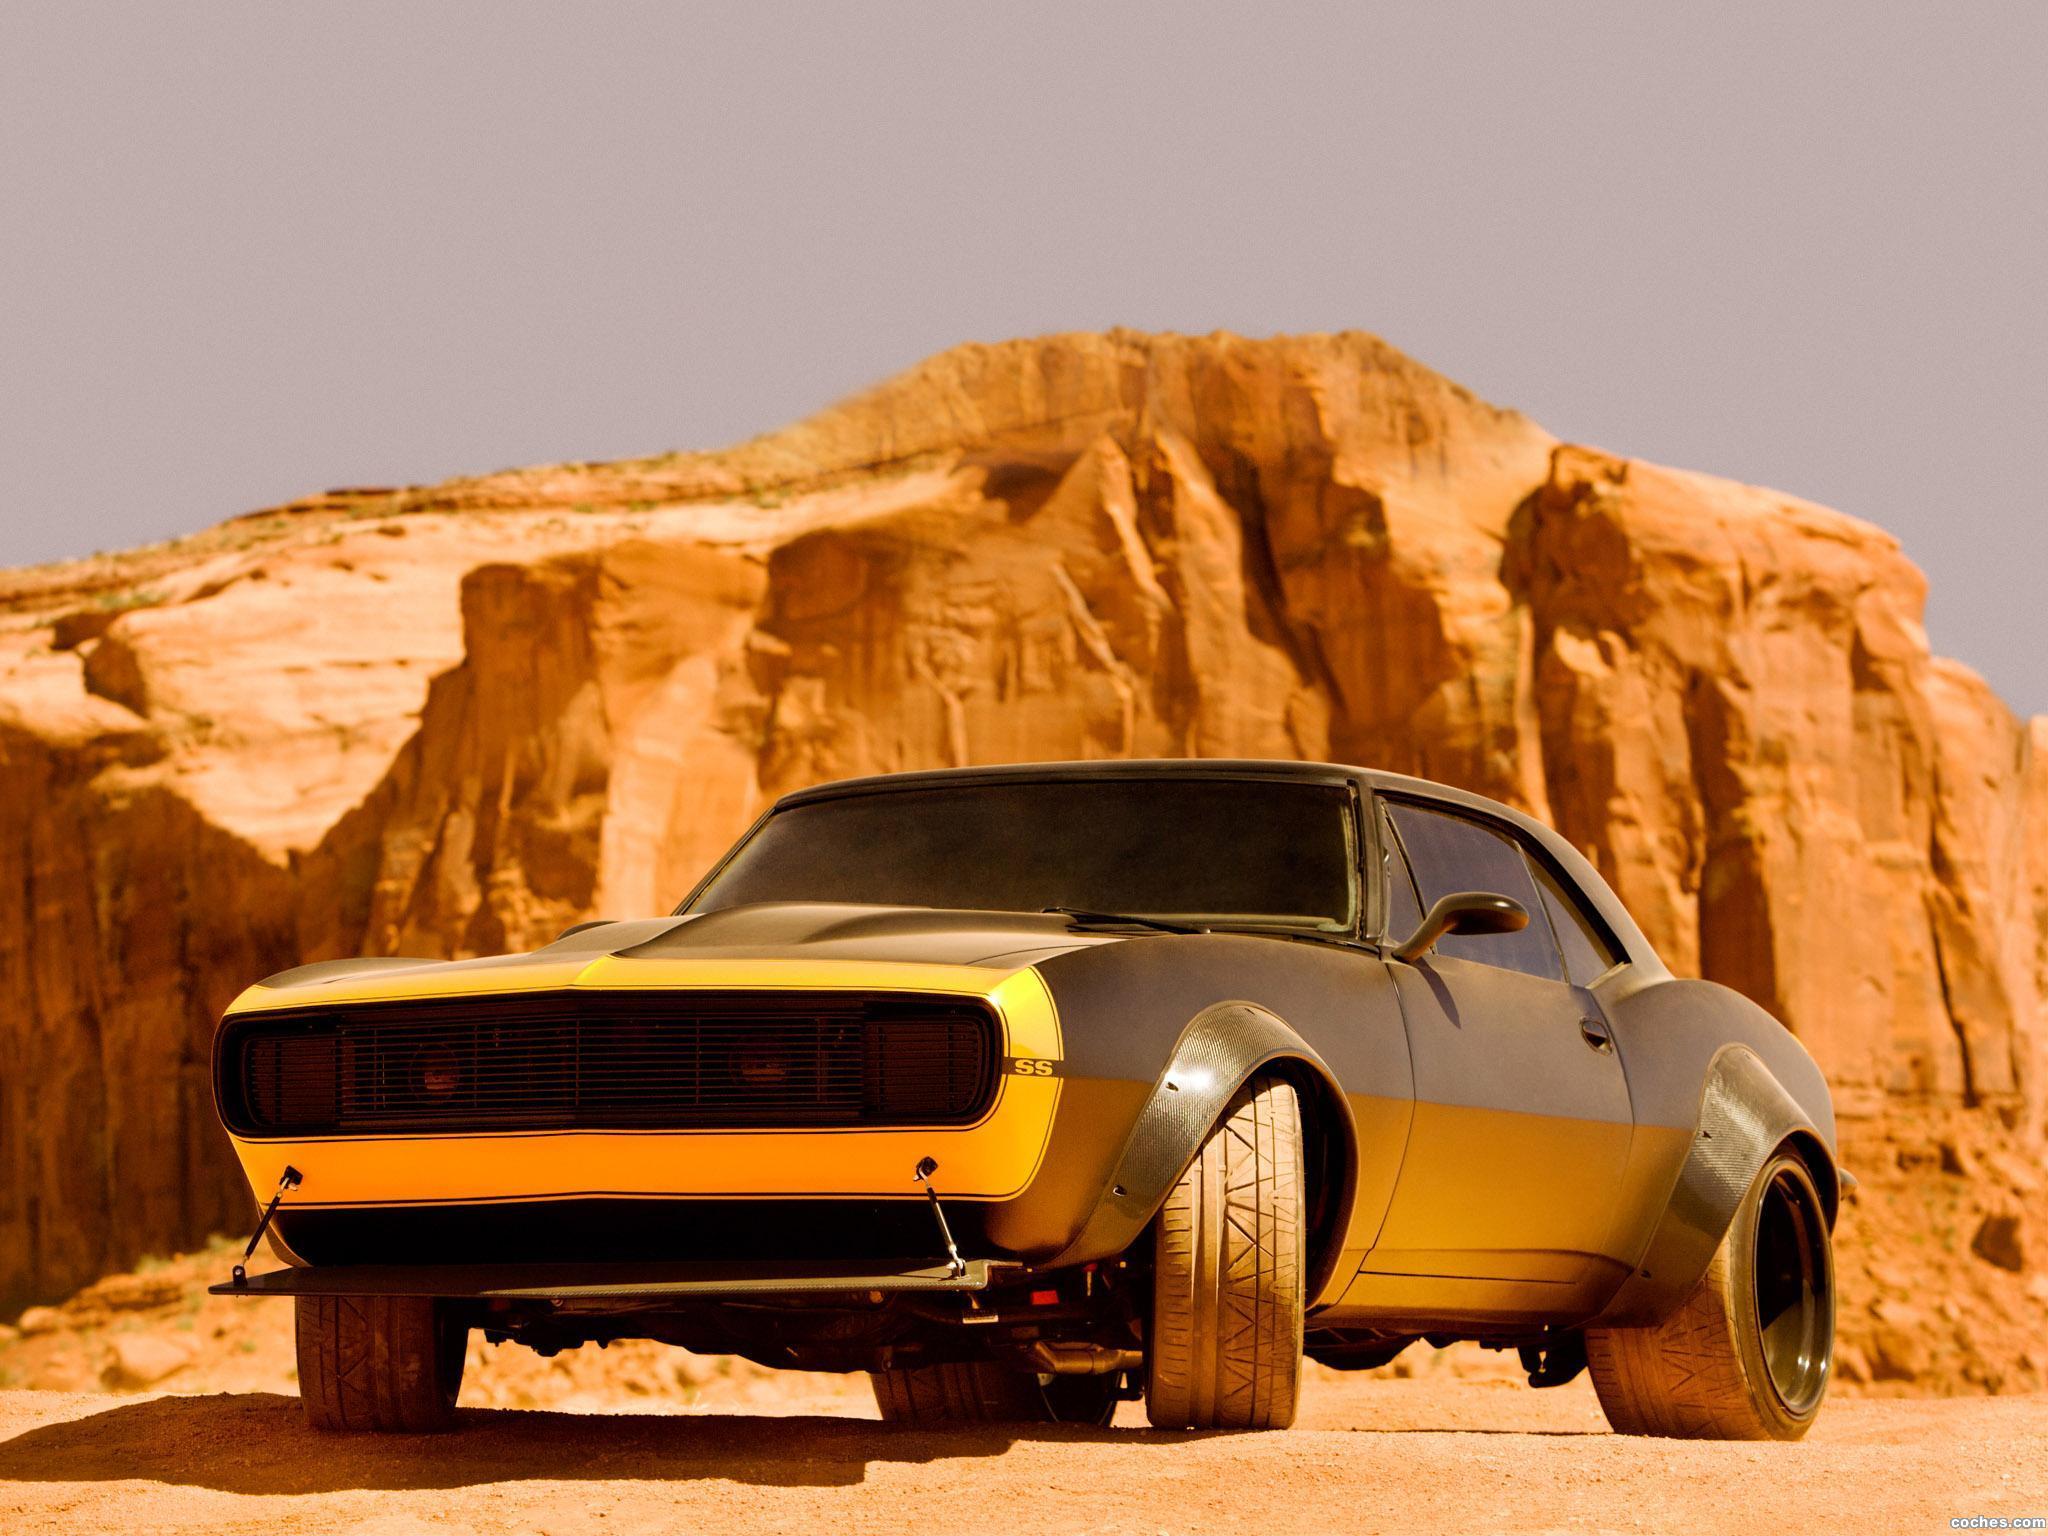 Fotos de Chevrolet Camaro SS 1967 Bumblebee Transformers 4 2014